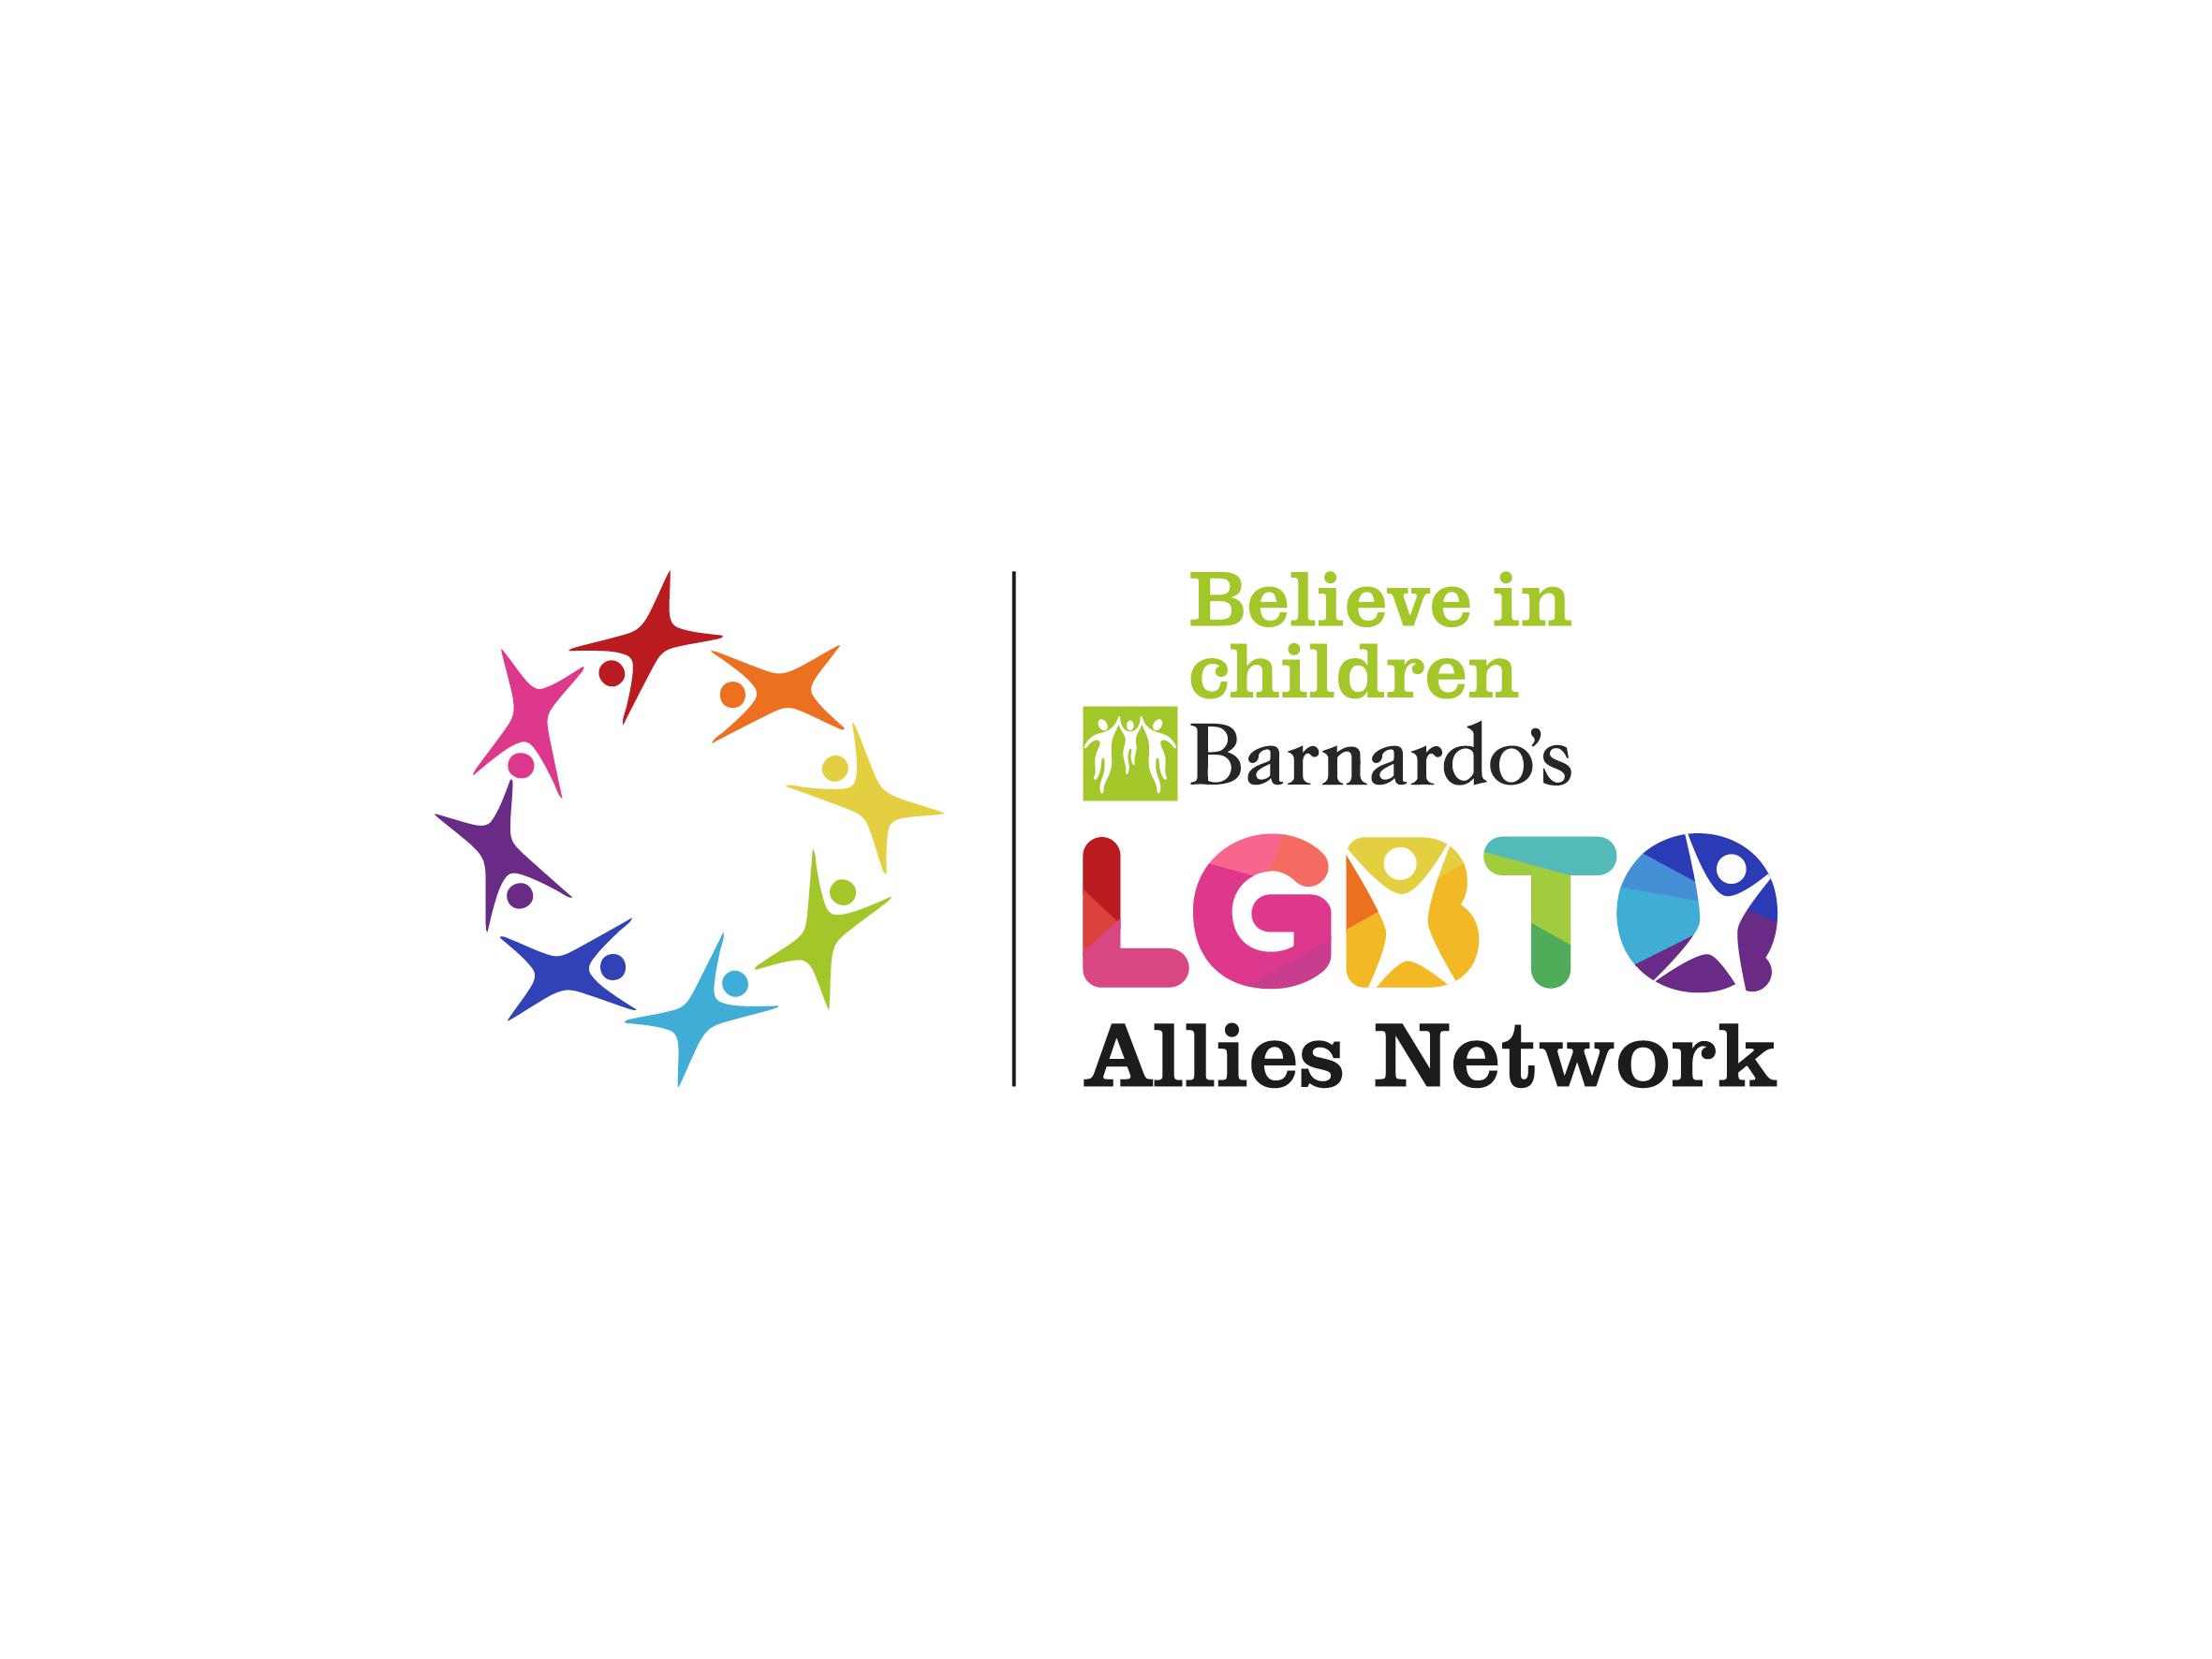 barnardos lgbtq allies network logo design designed by Dakini Design Saltaire, Shipley, Bradford